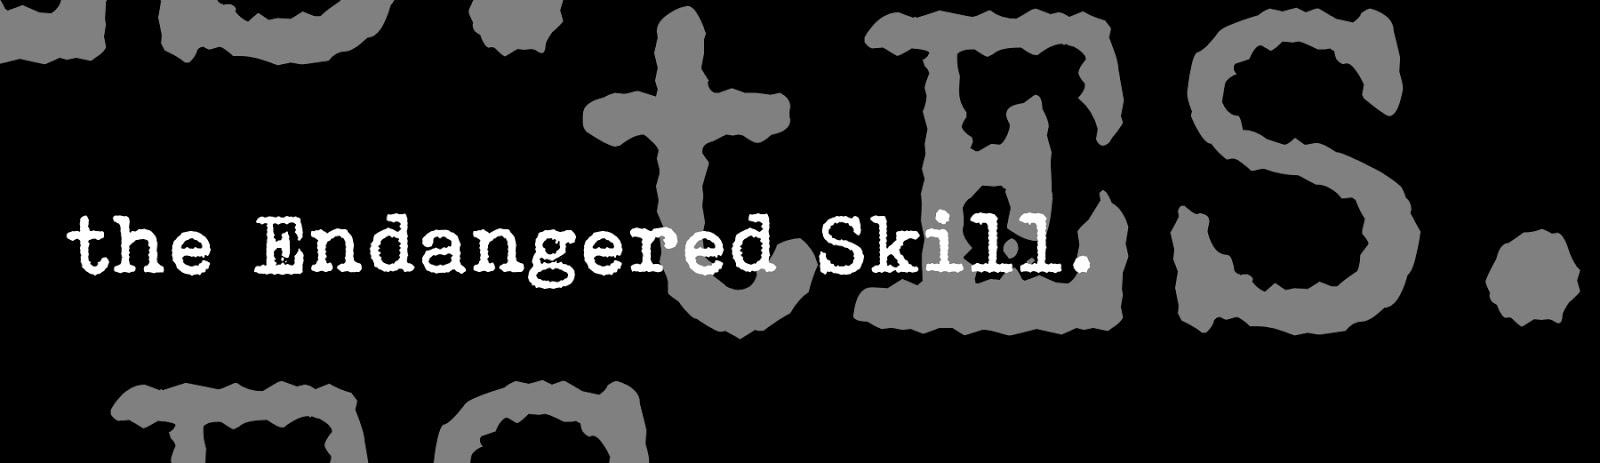 the Endangered Skill